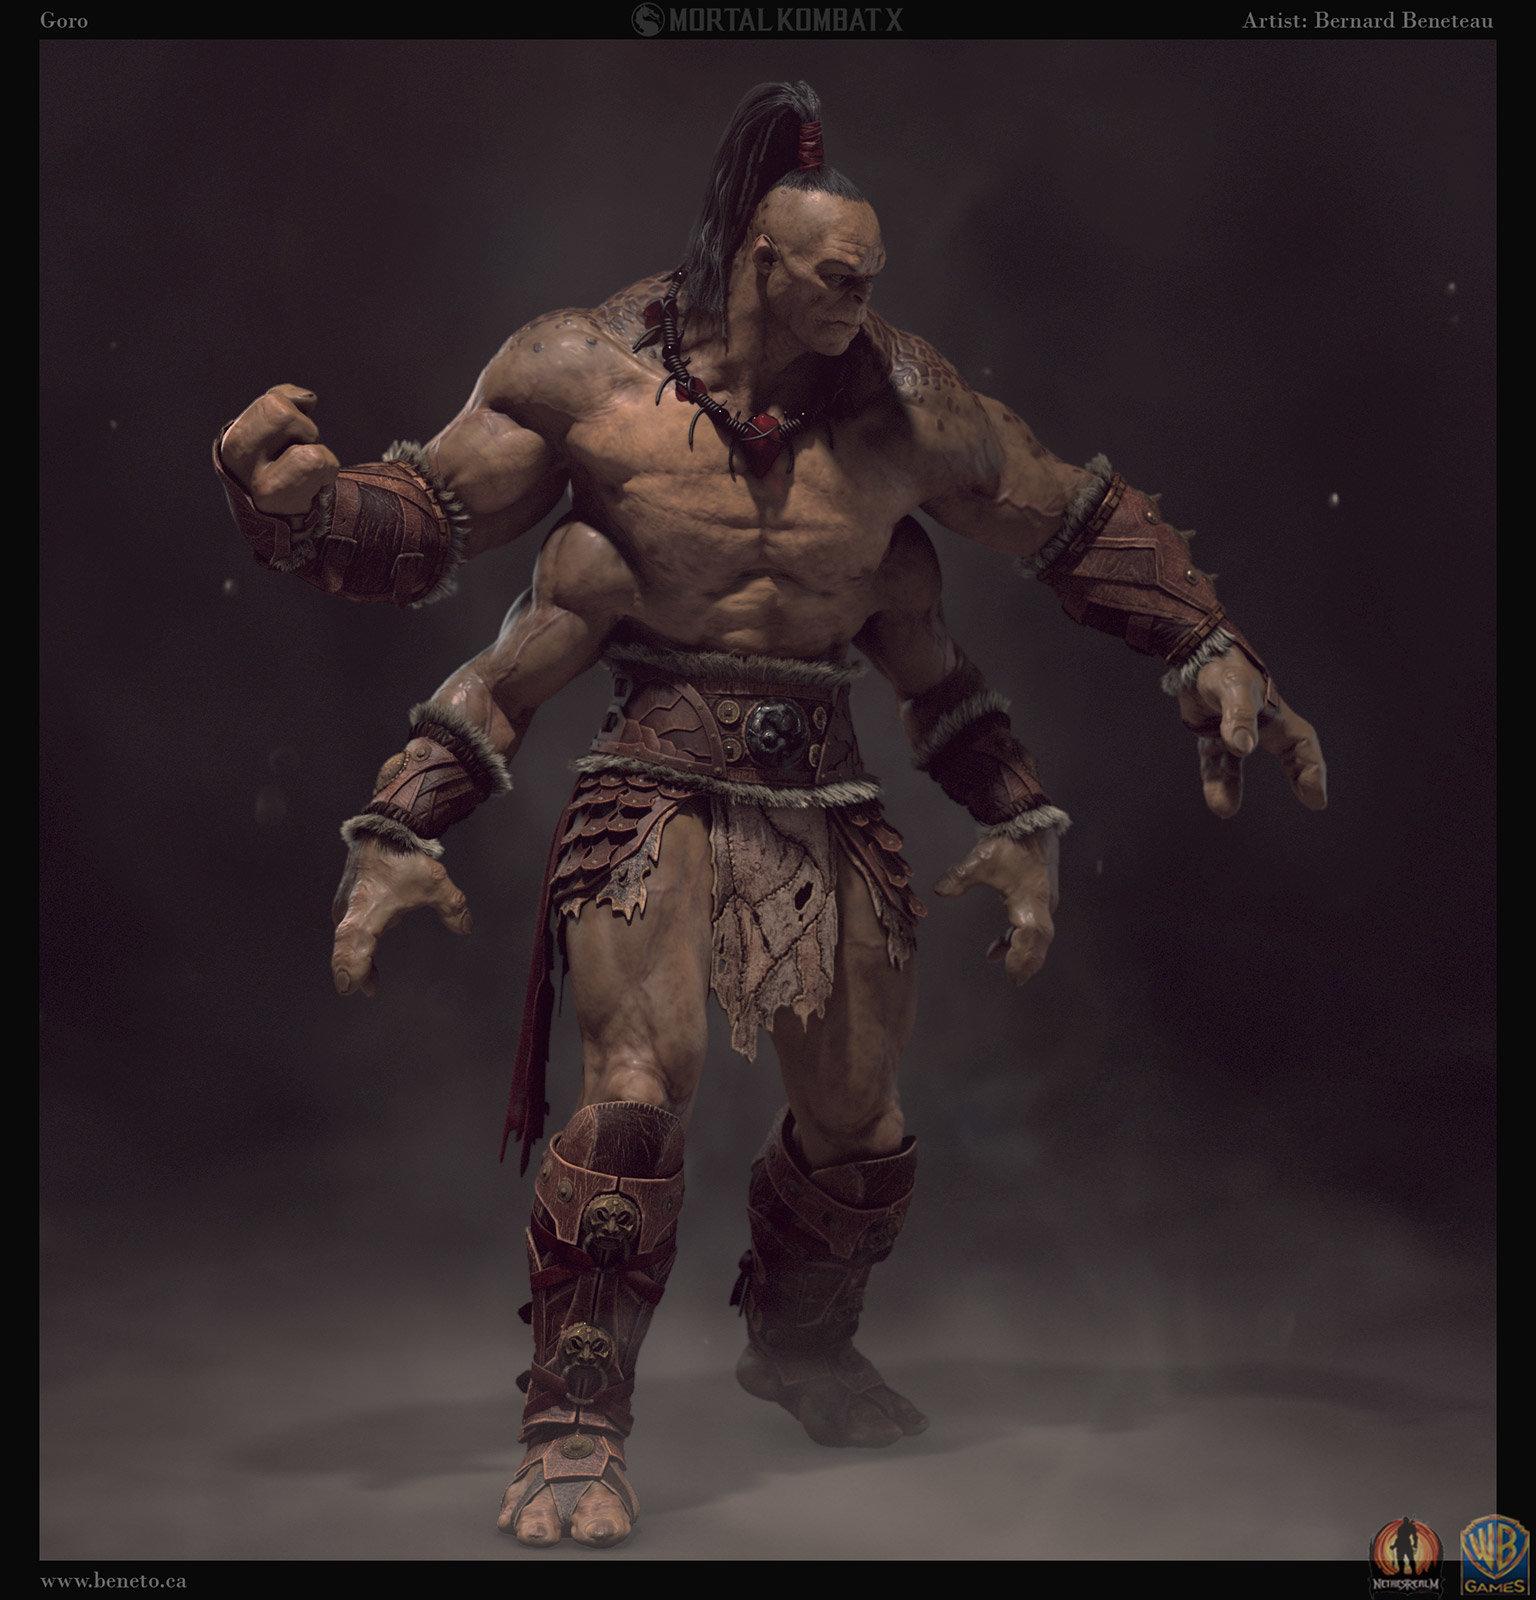 ArtStation - Mortal Kombat X - Goro, Bernard Beneteau